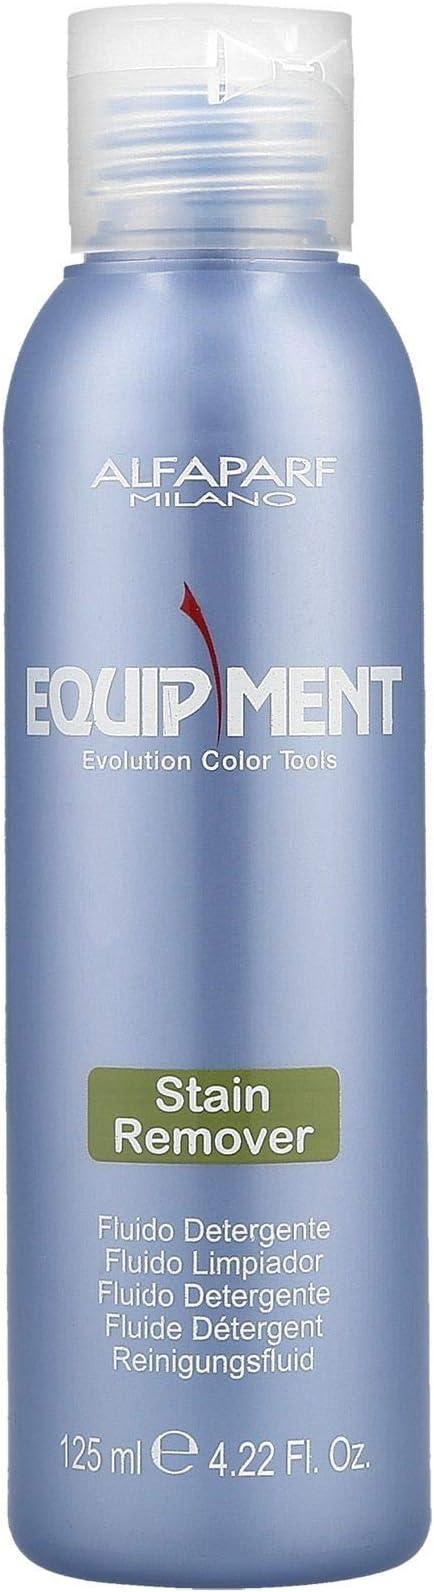 Alfaparf Equipment Fluido Removedor 125 ml: Amazon.es ...